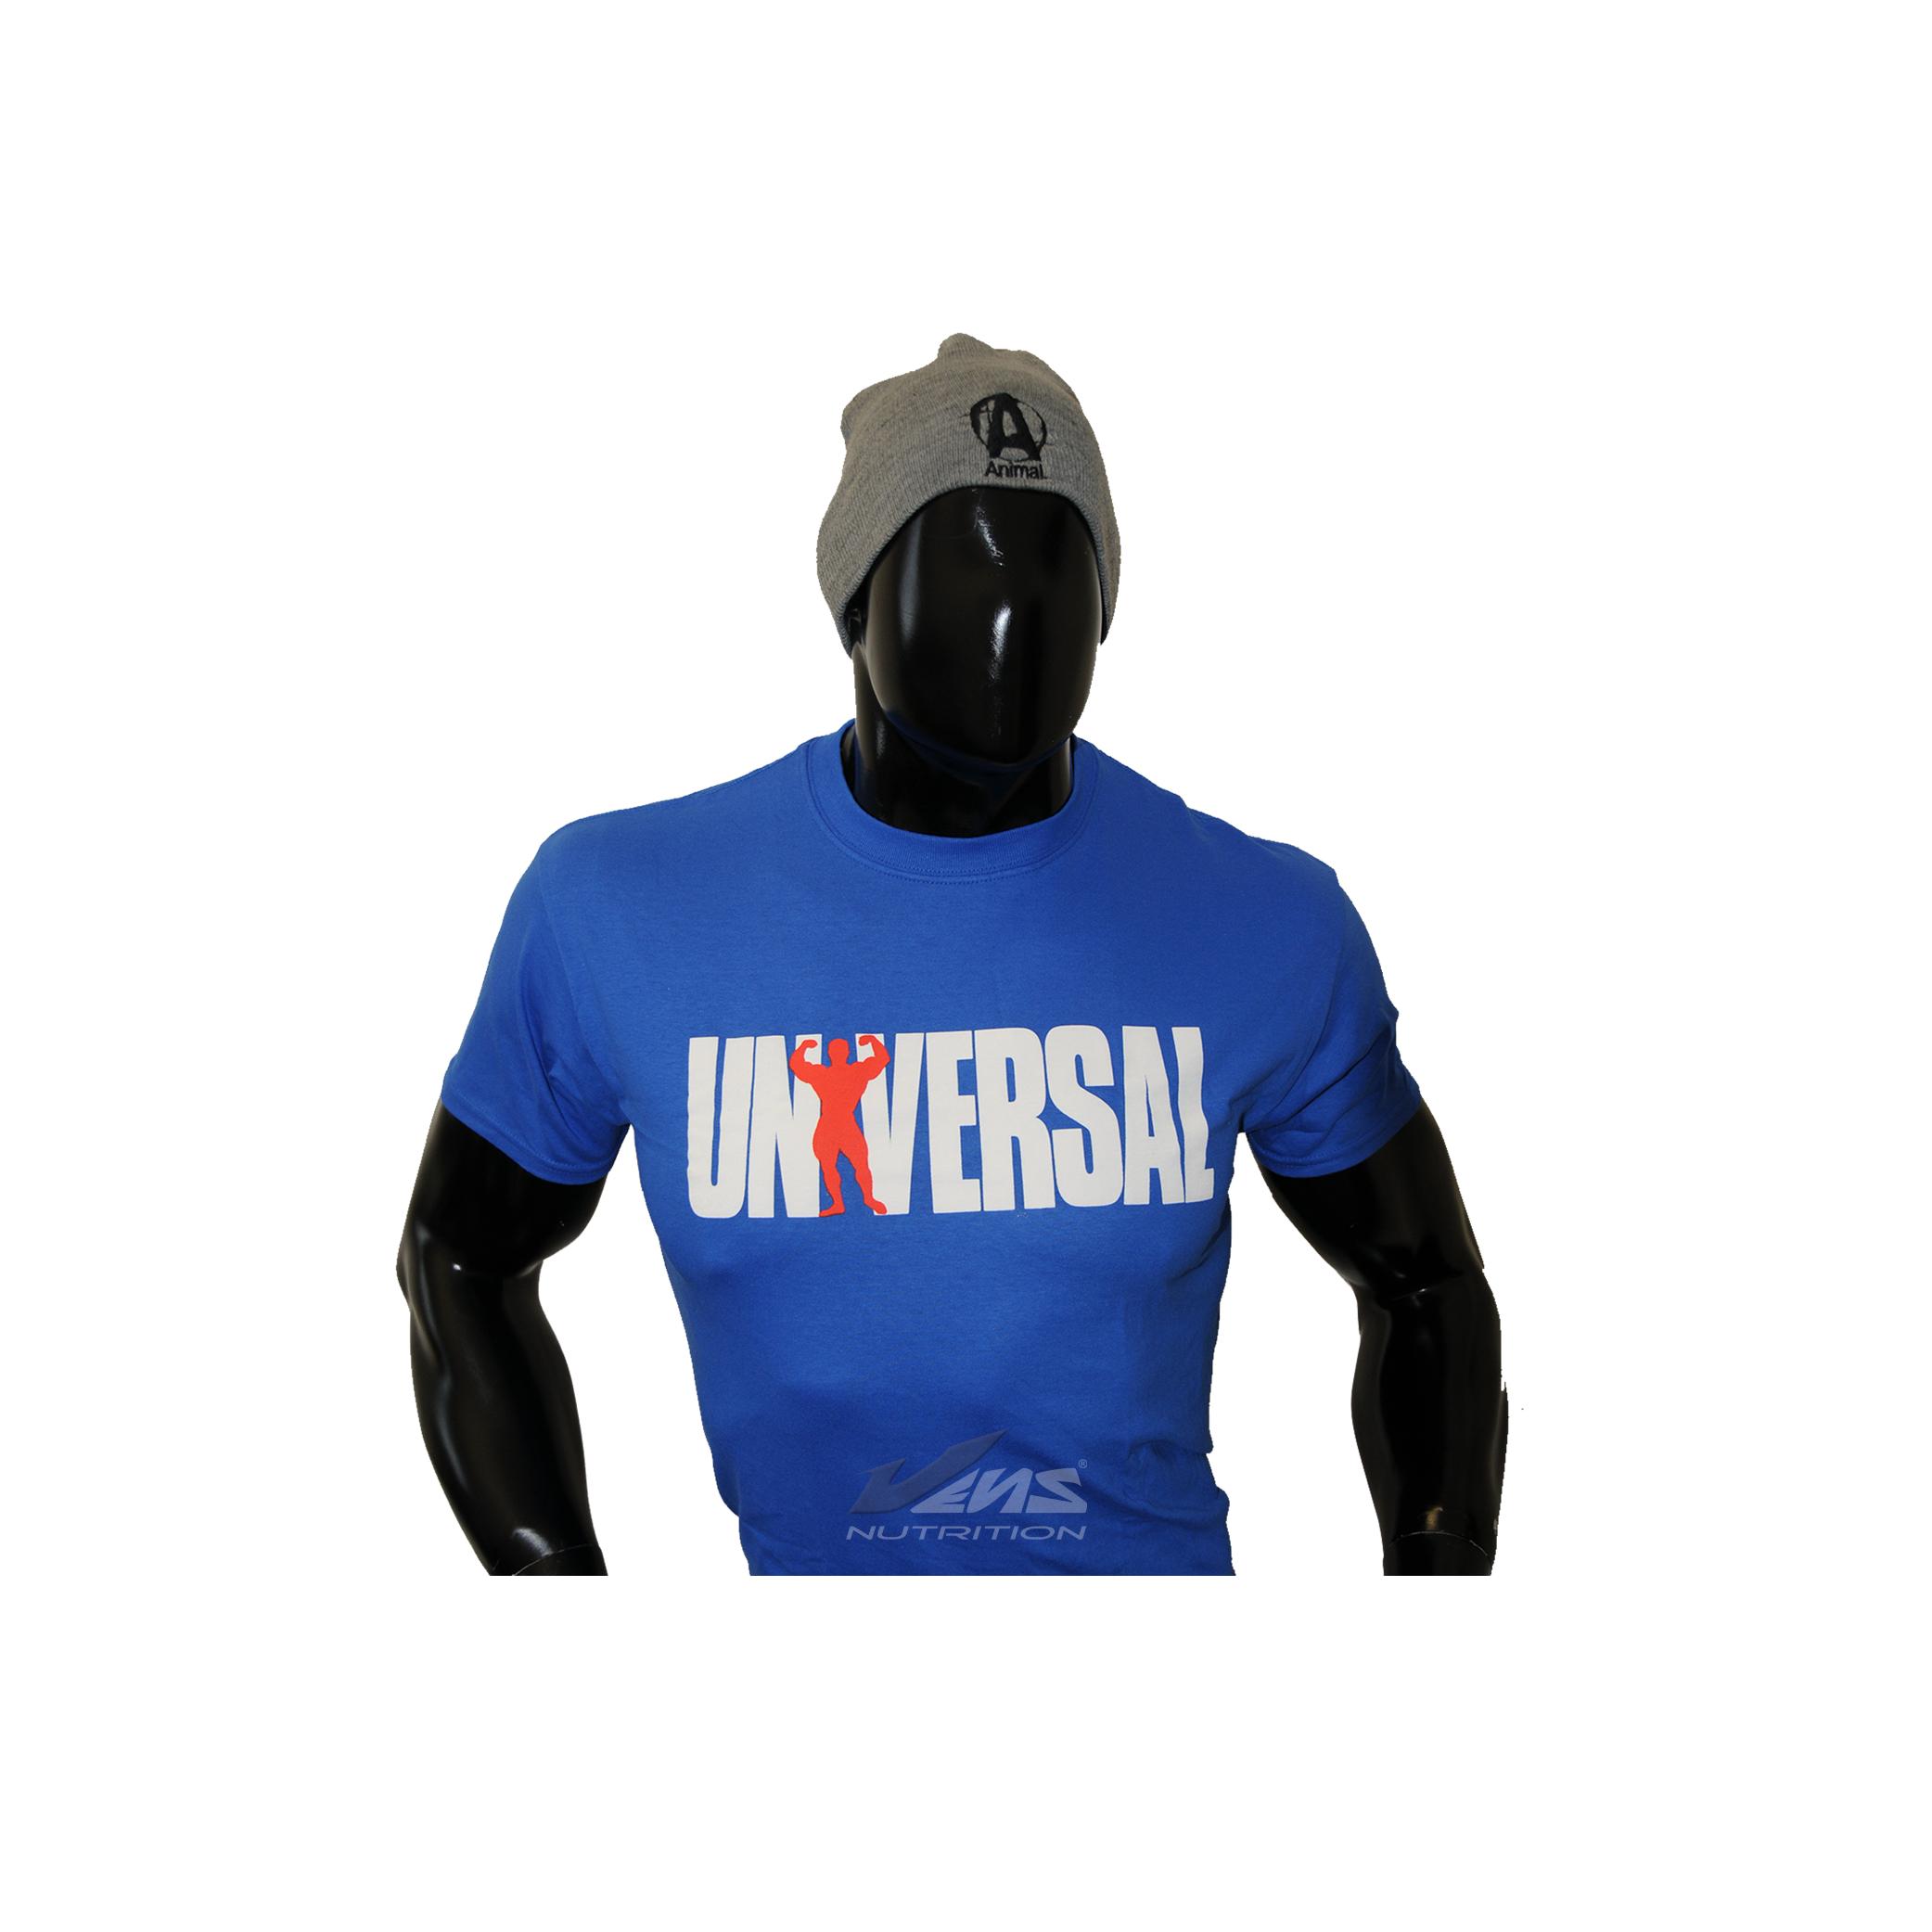 UNIVERSAL-BLUE-SHIRT